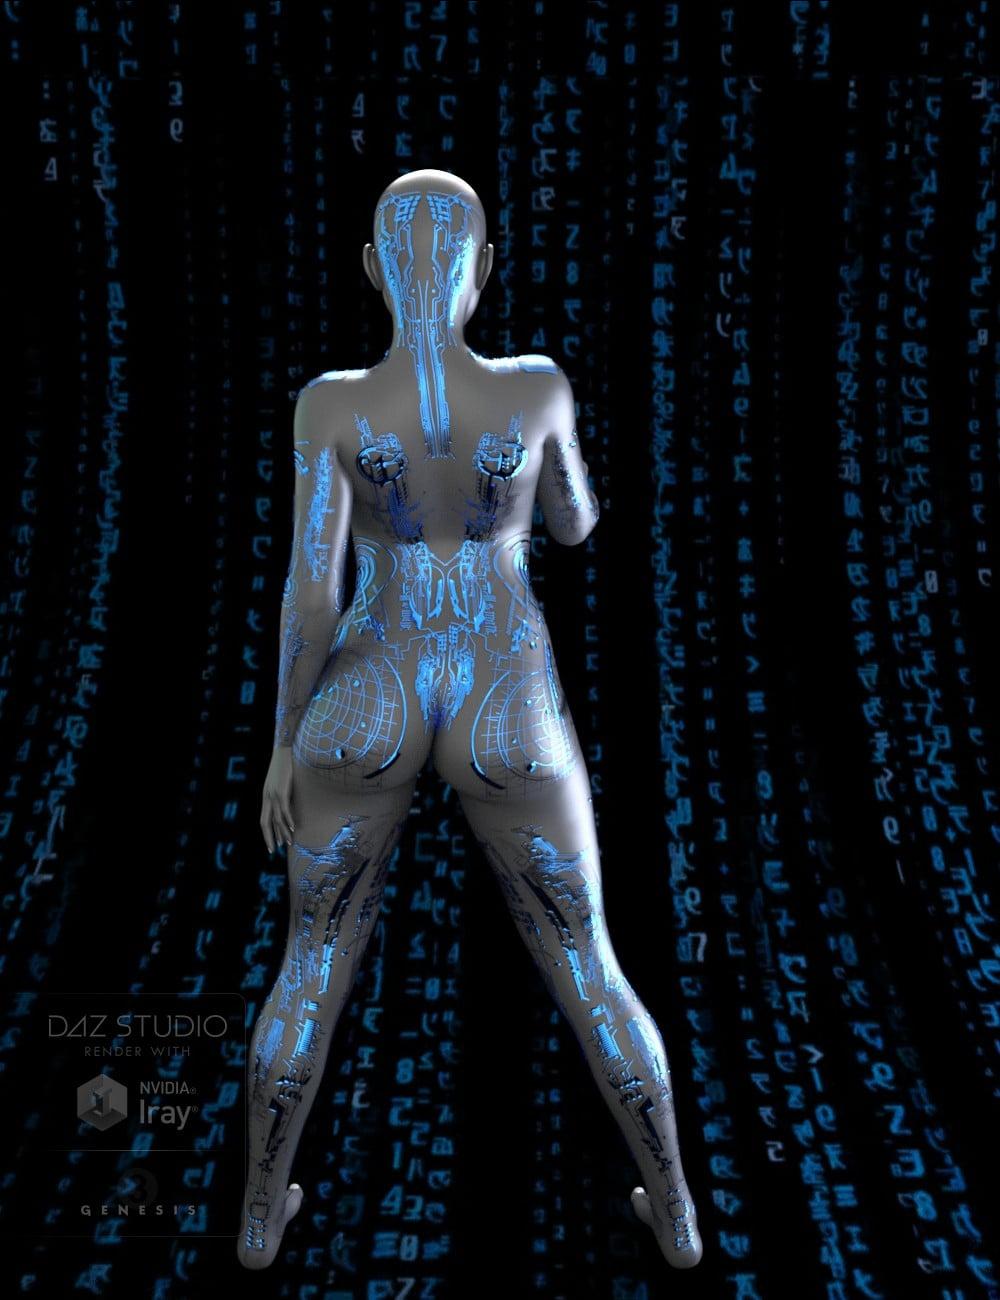 01-body-art-for-genesis-3-females-a-metal-magic-overlays-addon-daz3d